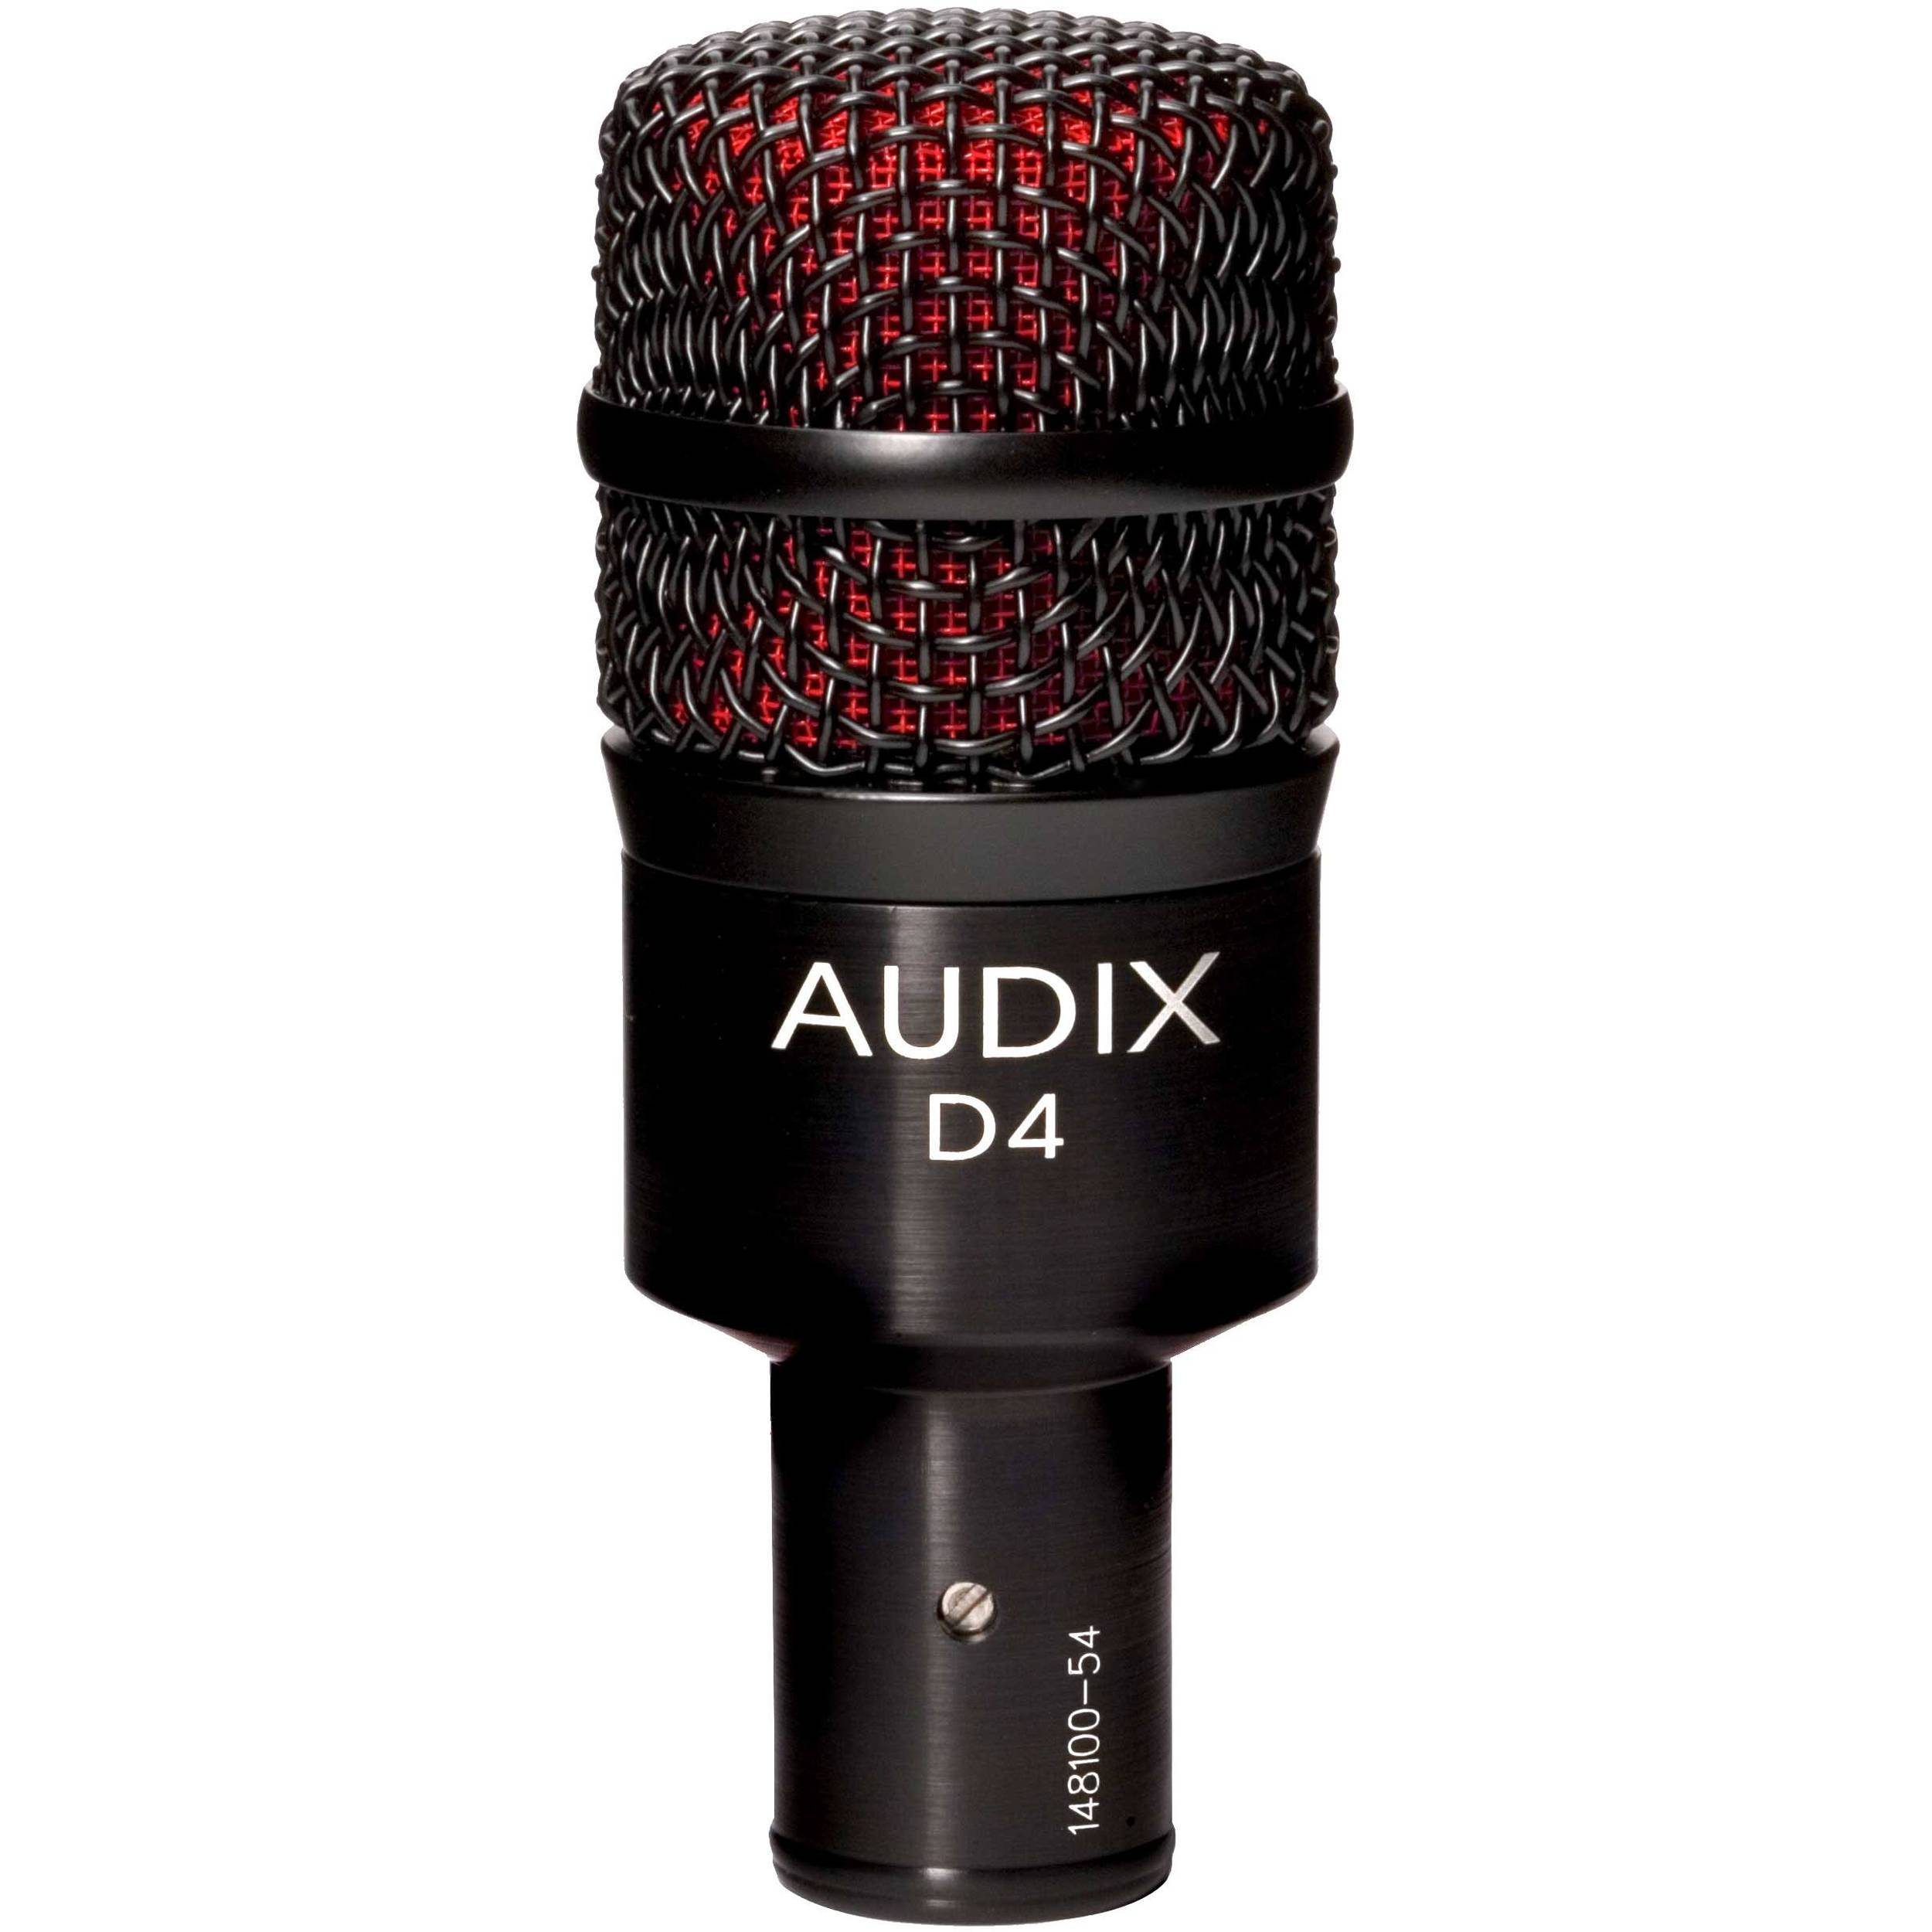 Audix D4 Hypercardioid Dynamic Instrument Microphone